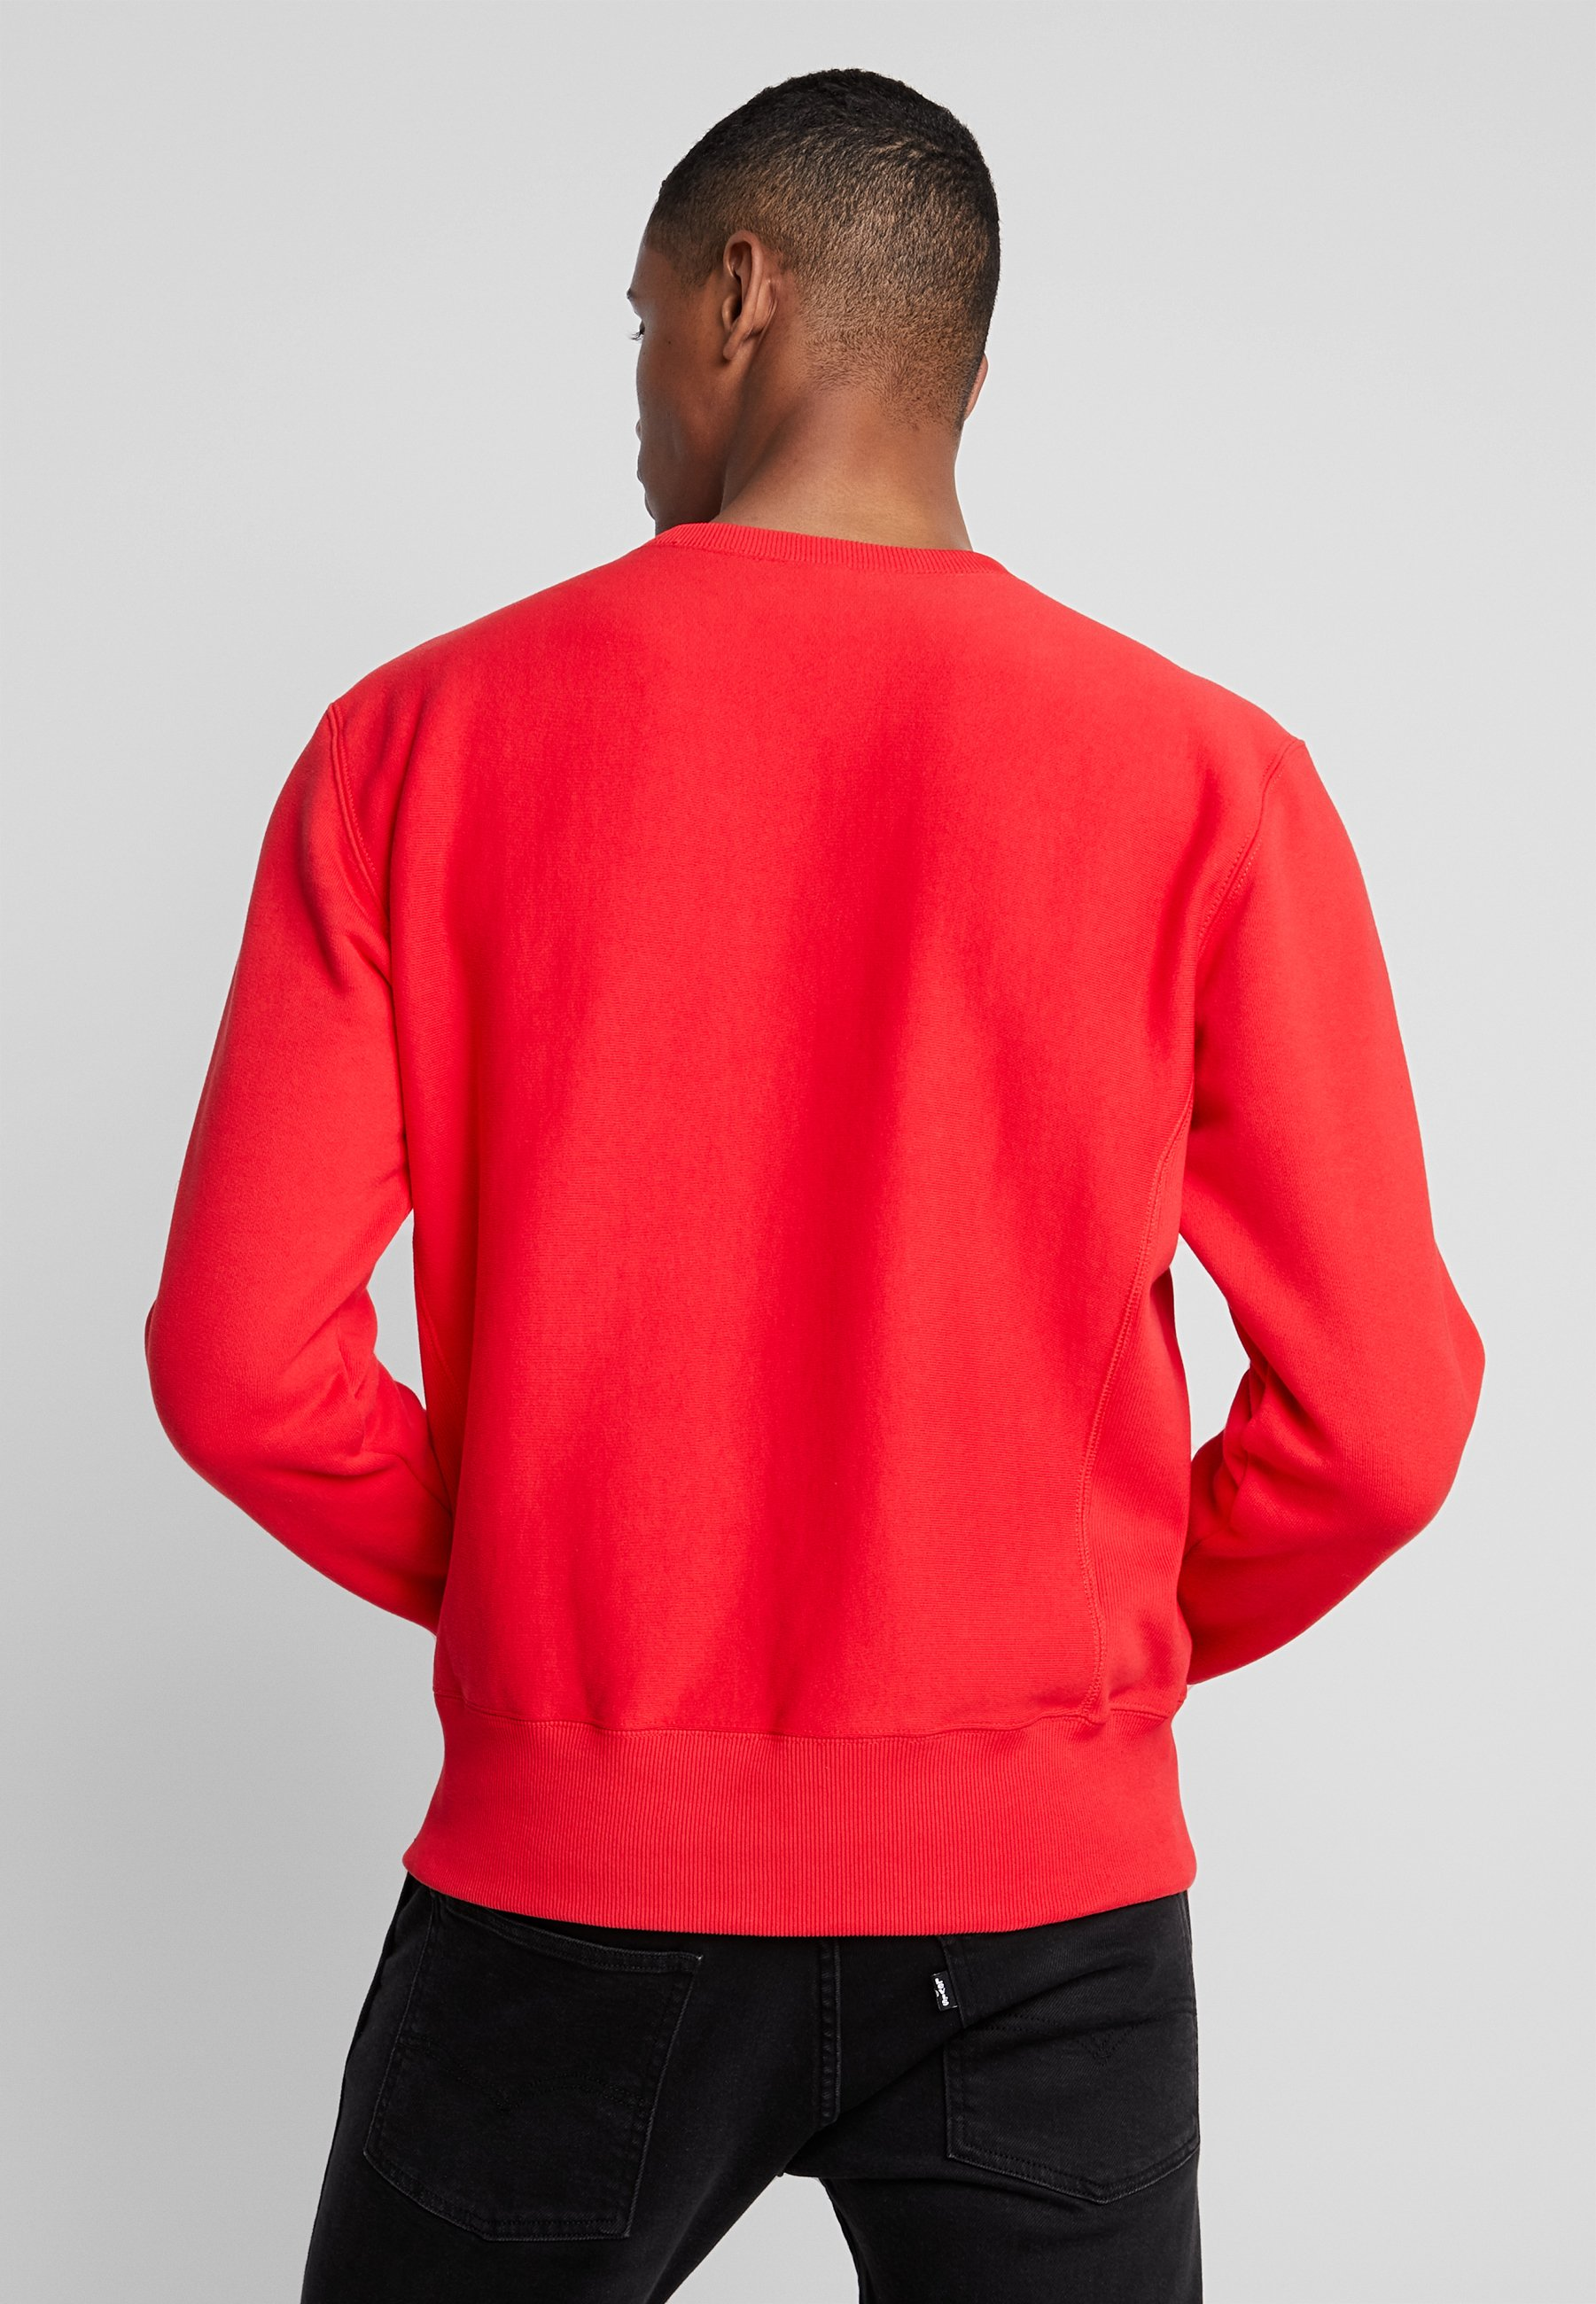 Script Small Weave Reverse Red CrewneckSweatshirt Champion PXOZTkiu